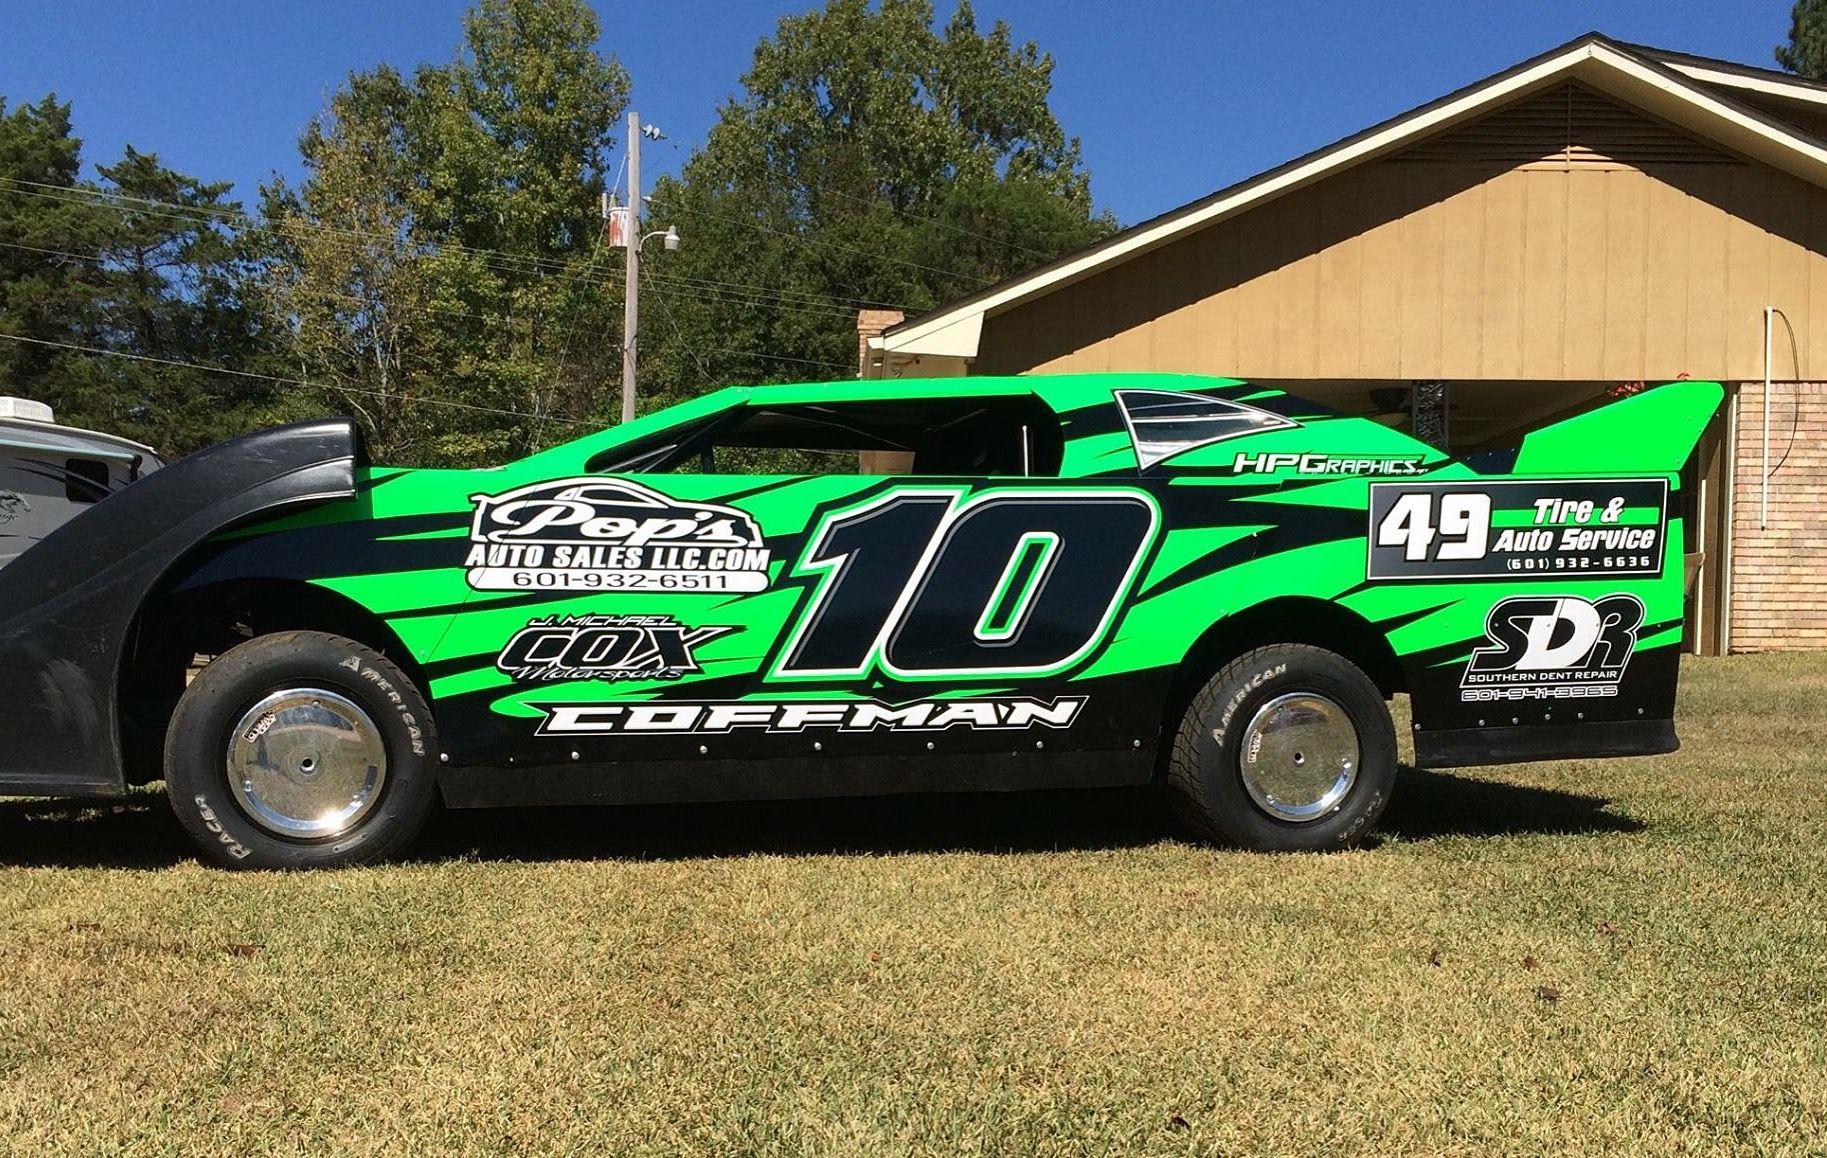 Tony Coffman Dirt Mini Stock Race Car By Hpgraphics Net Race Cars Racing Nascar